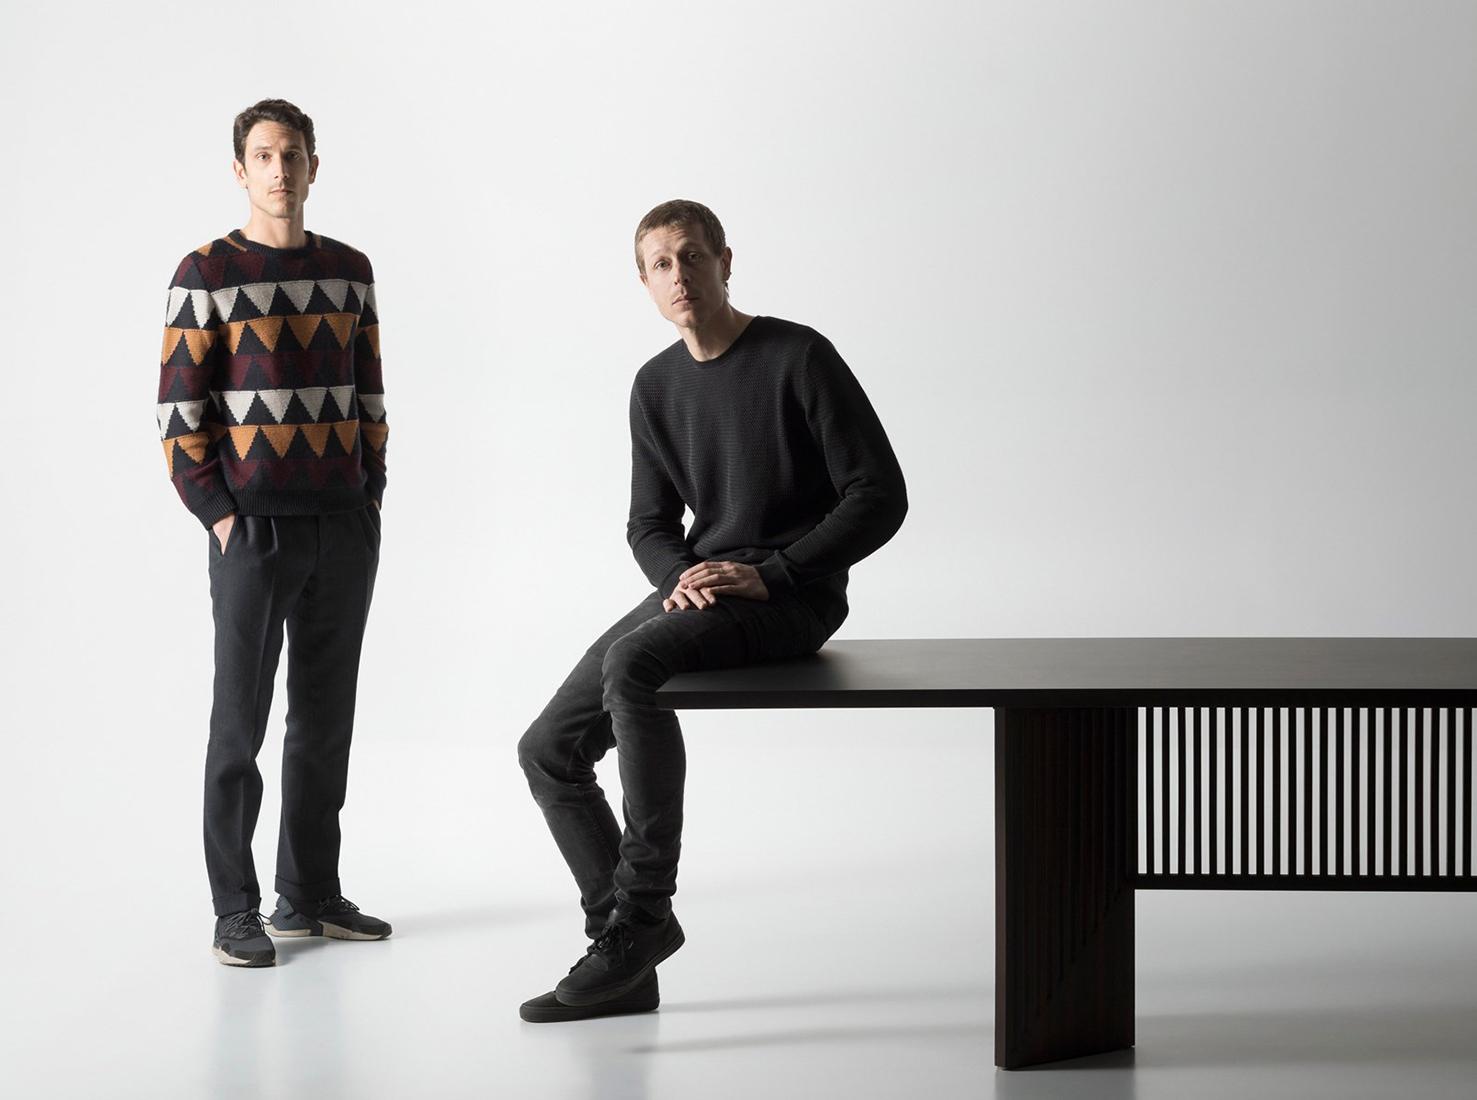 Франческо Меда и Давид Лопес Кинкосес фото